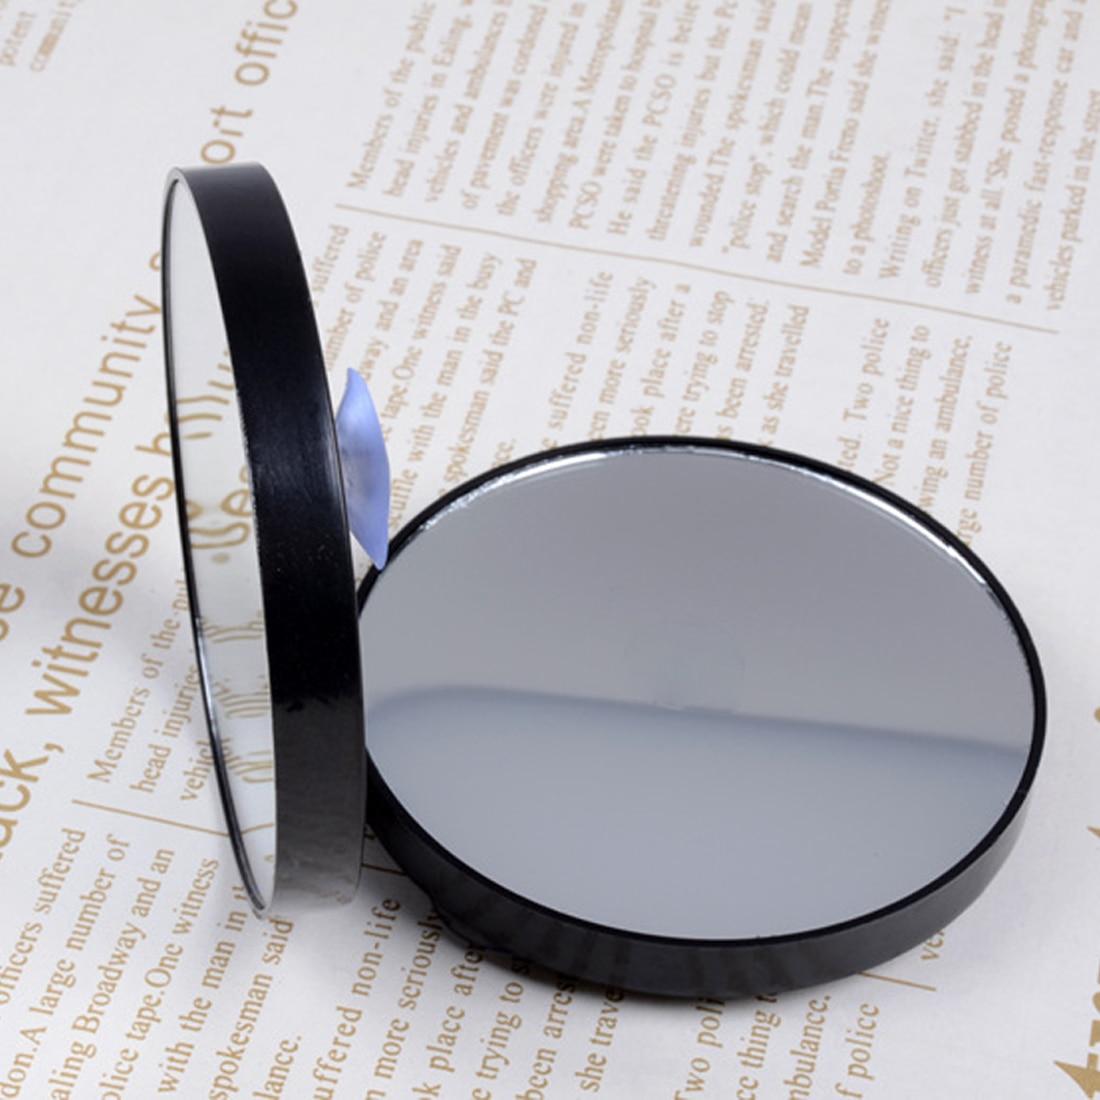 Top Selling Makeup Mirror 3 5 10 15x Magnifying Mirror